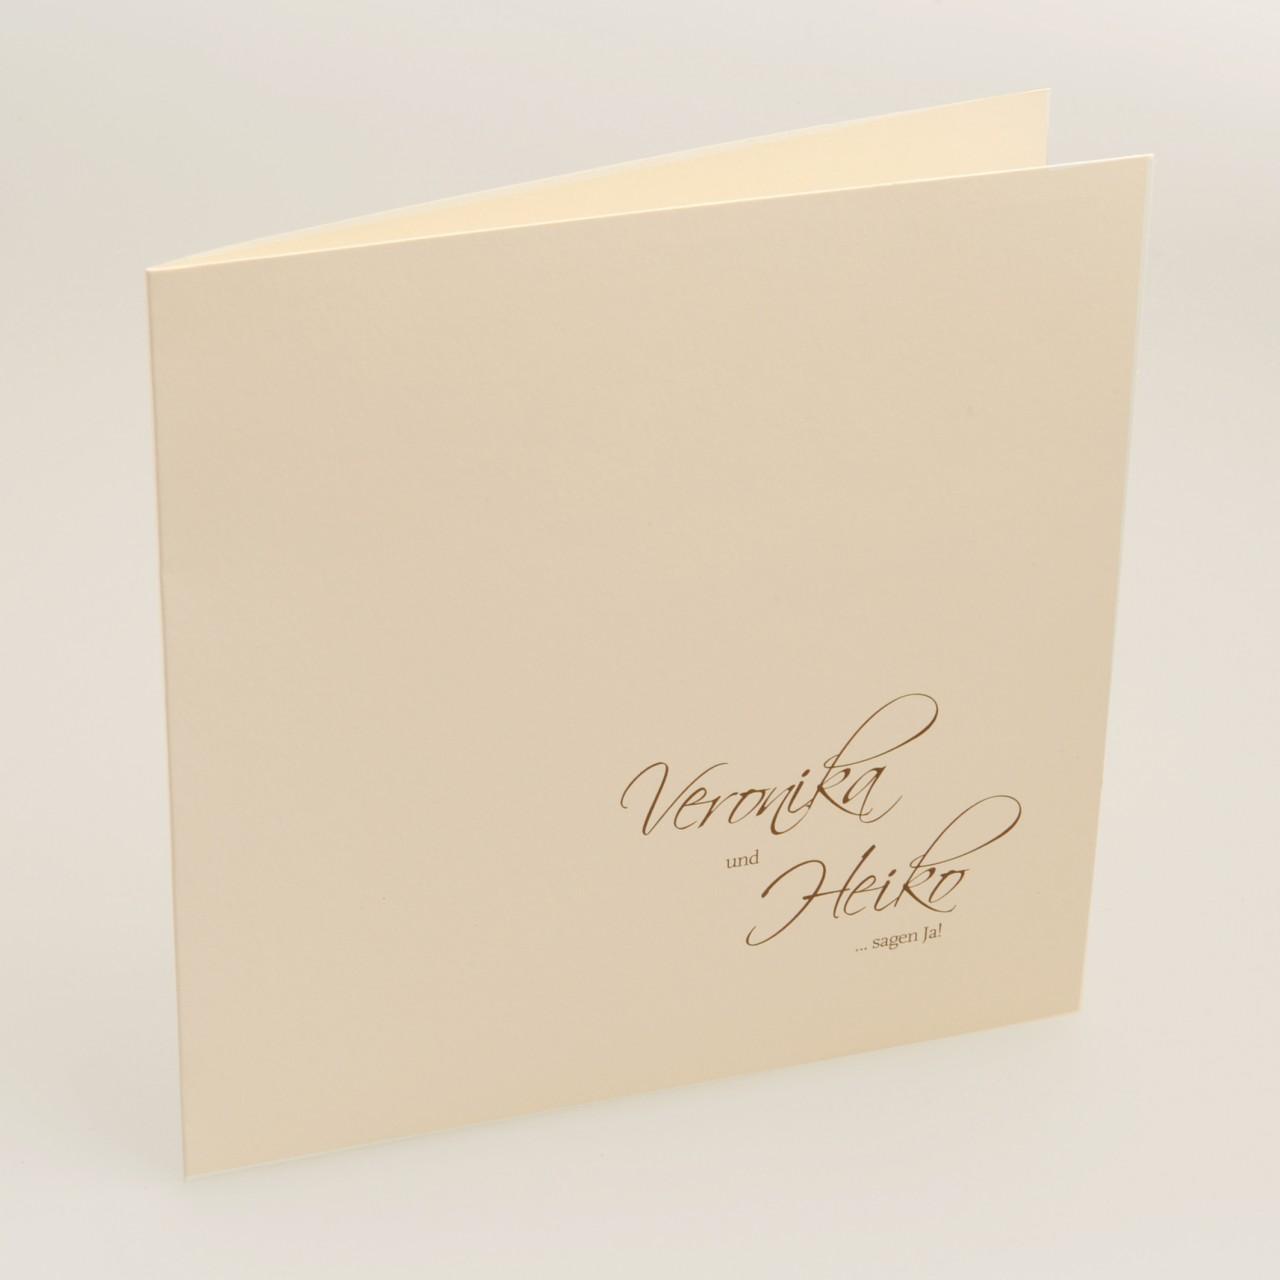 Blancokarte - B 3720